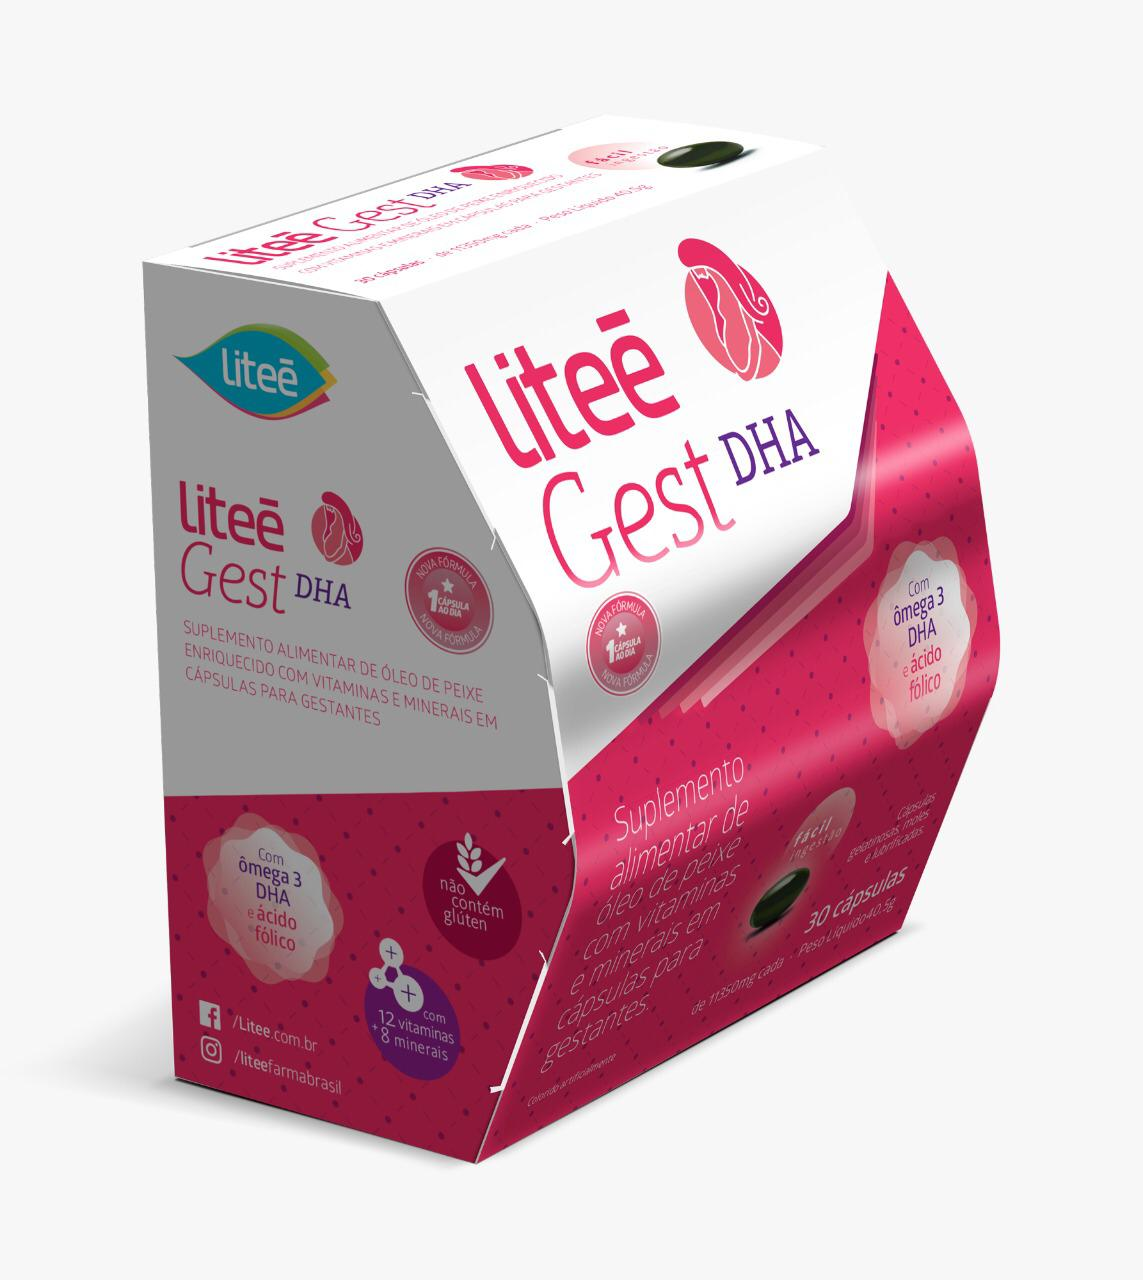 LiteeGest DHA Multivitamínico para GESTANTES com  Ácido Fólico ,  Ômega3  e Vitaminas - 30 Cápsulas Gelatinosas